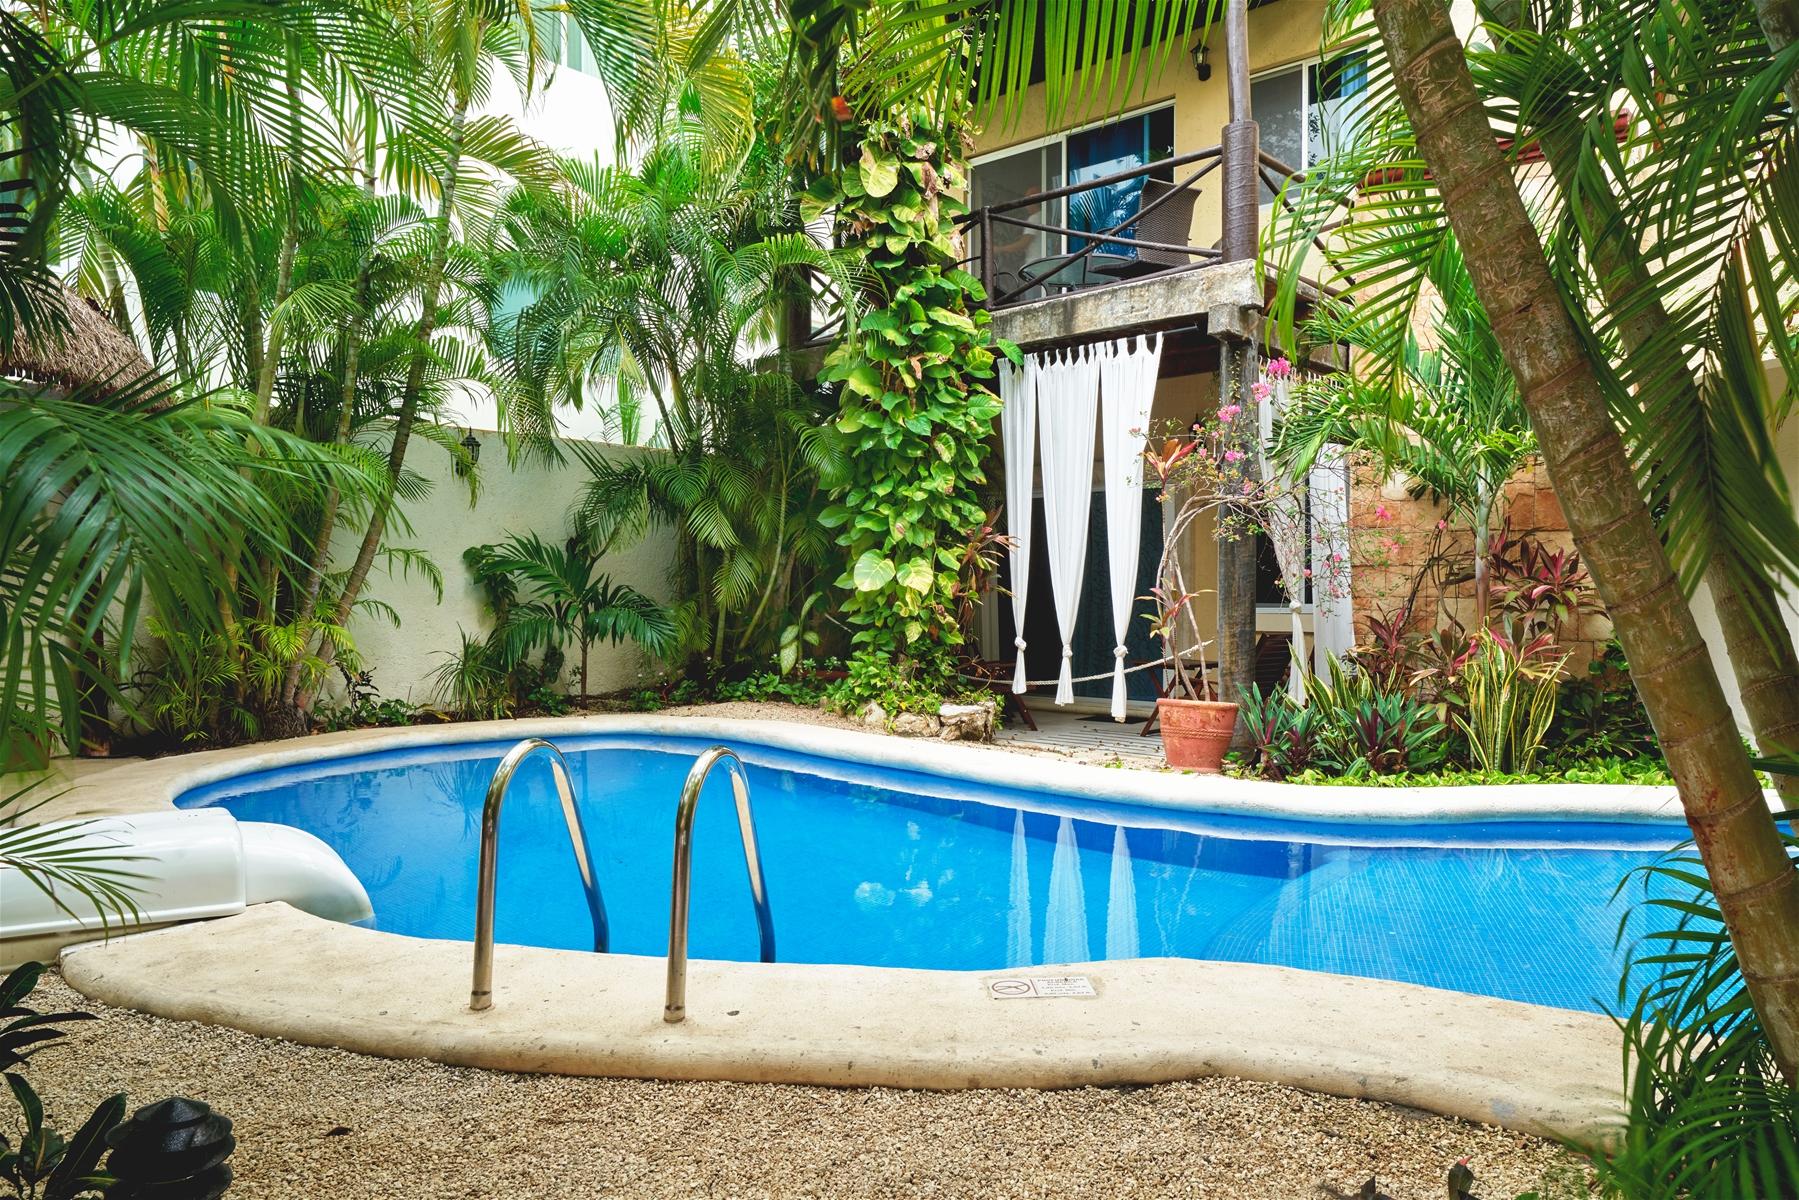 The Magic Paradise Community Swimming Pool